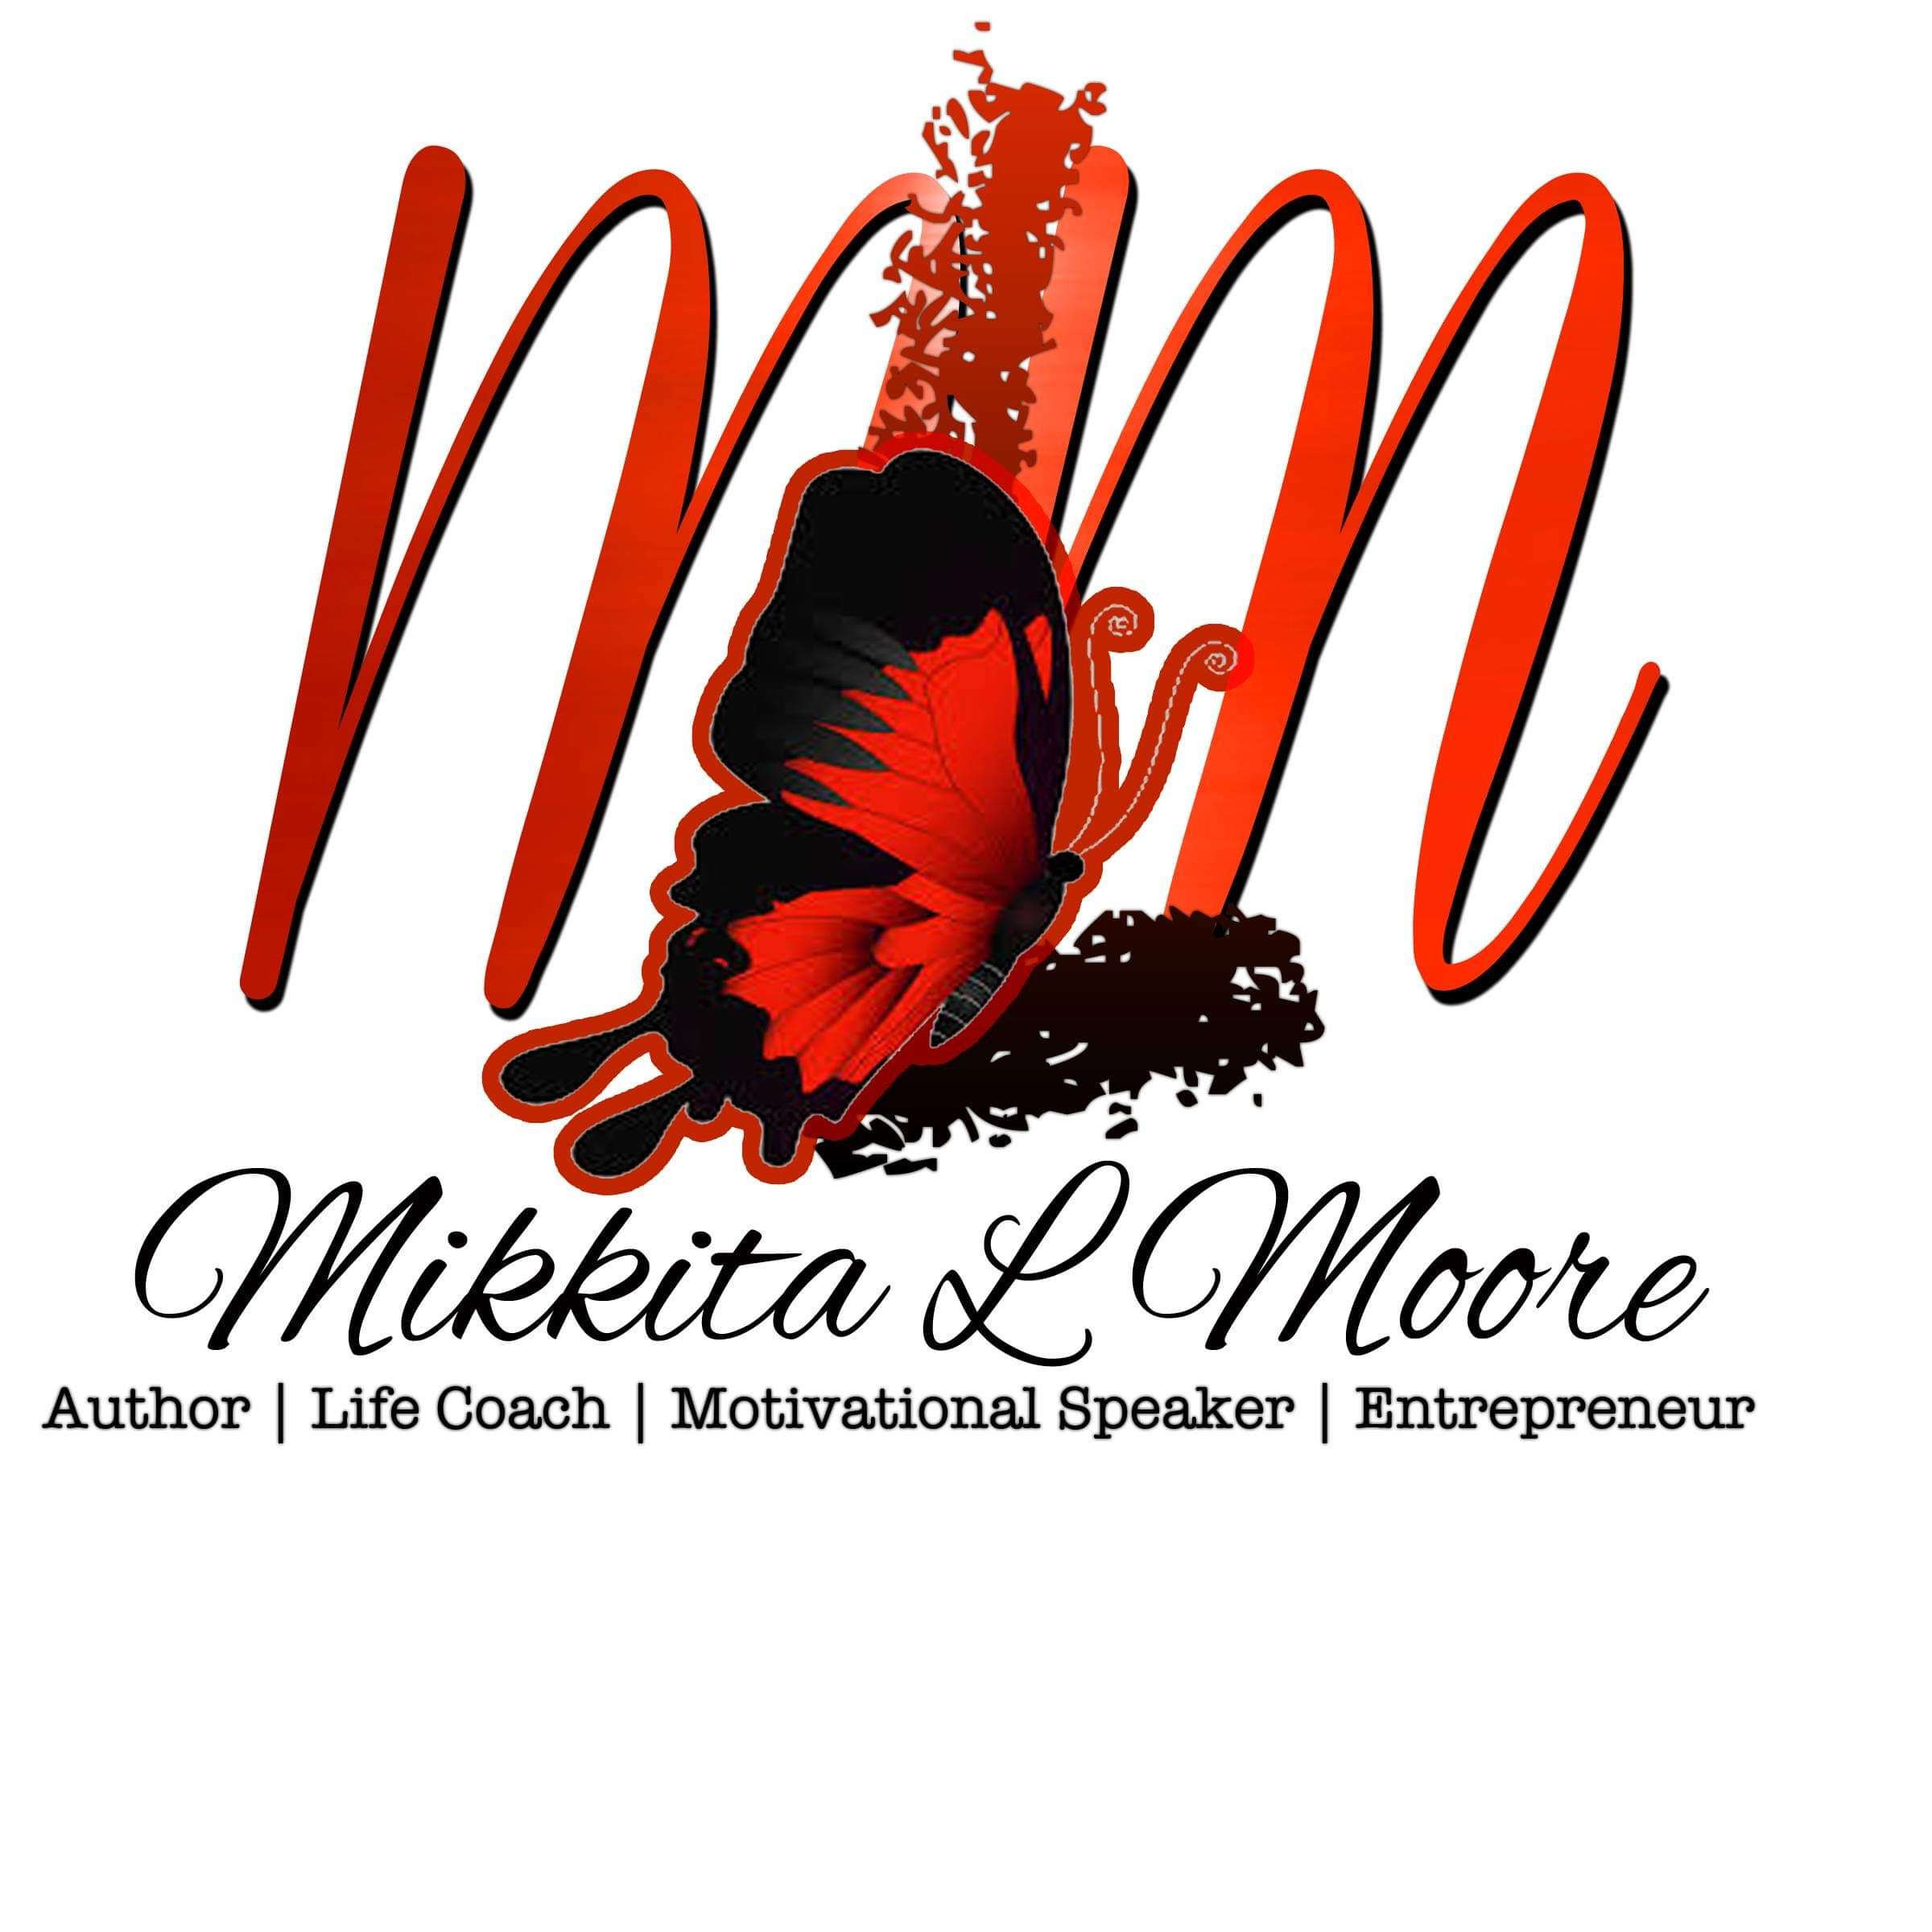 Mikkita Moore